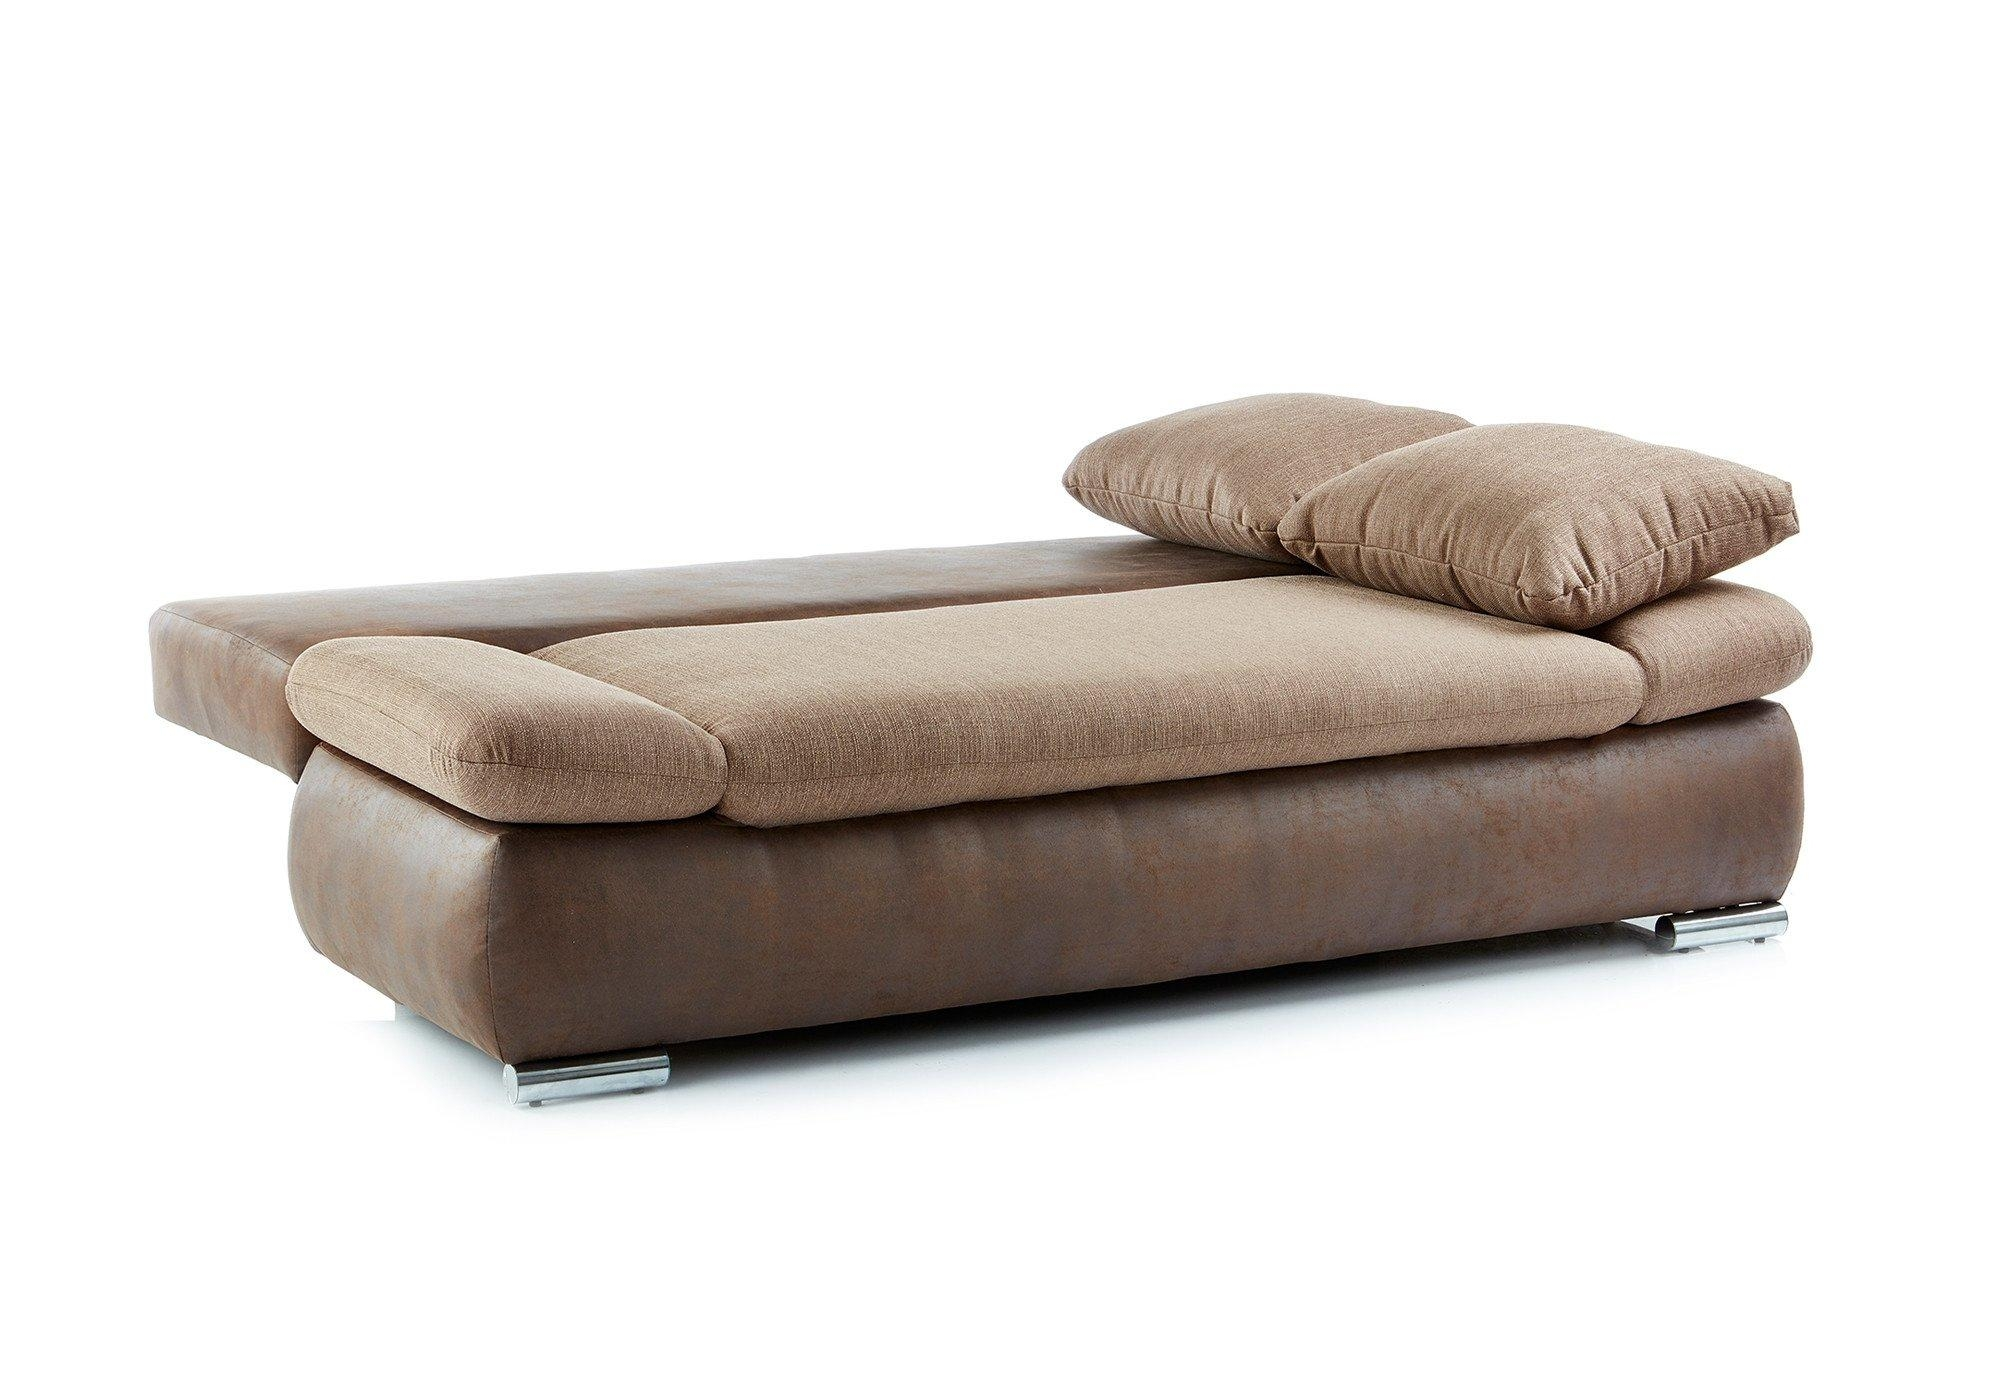 Mini Sofa Bed Easy As Sleeper Sofas For Sofa Set Within Mini Sofa Sleepers (View 13 of 20)